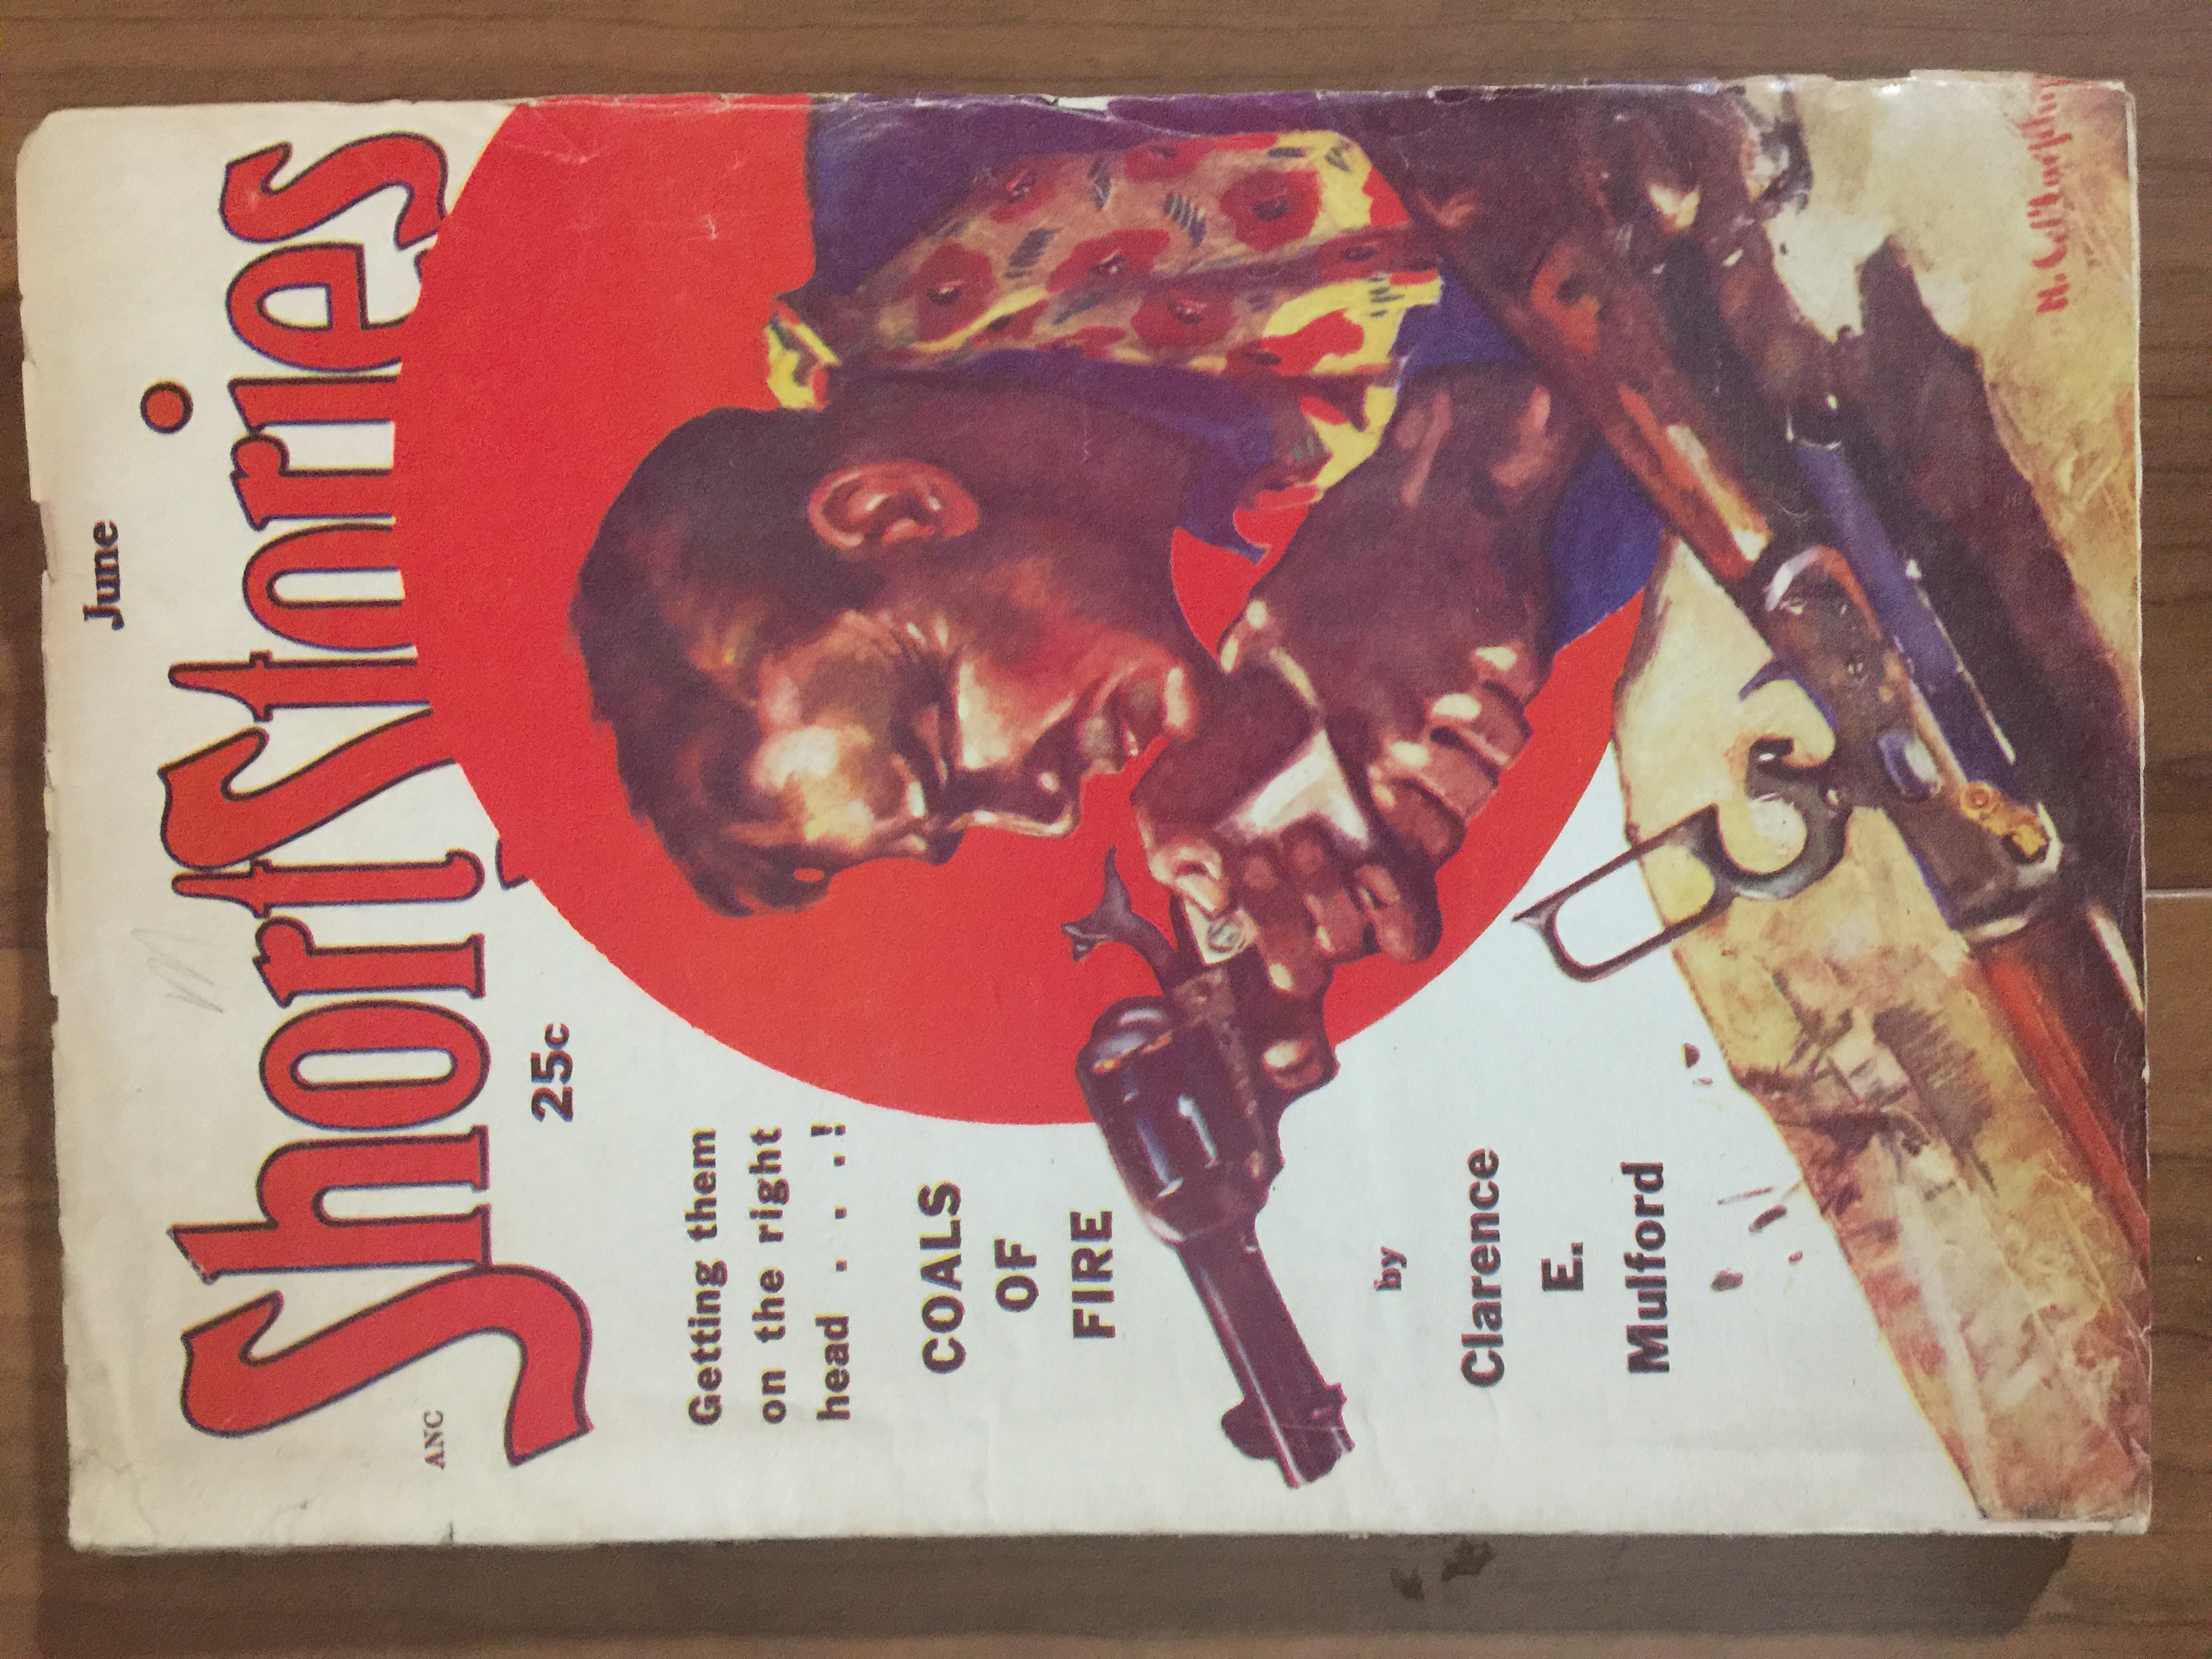 1951 Jun last pulp-sized issue of Short Stories, all reprints, no original fiction